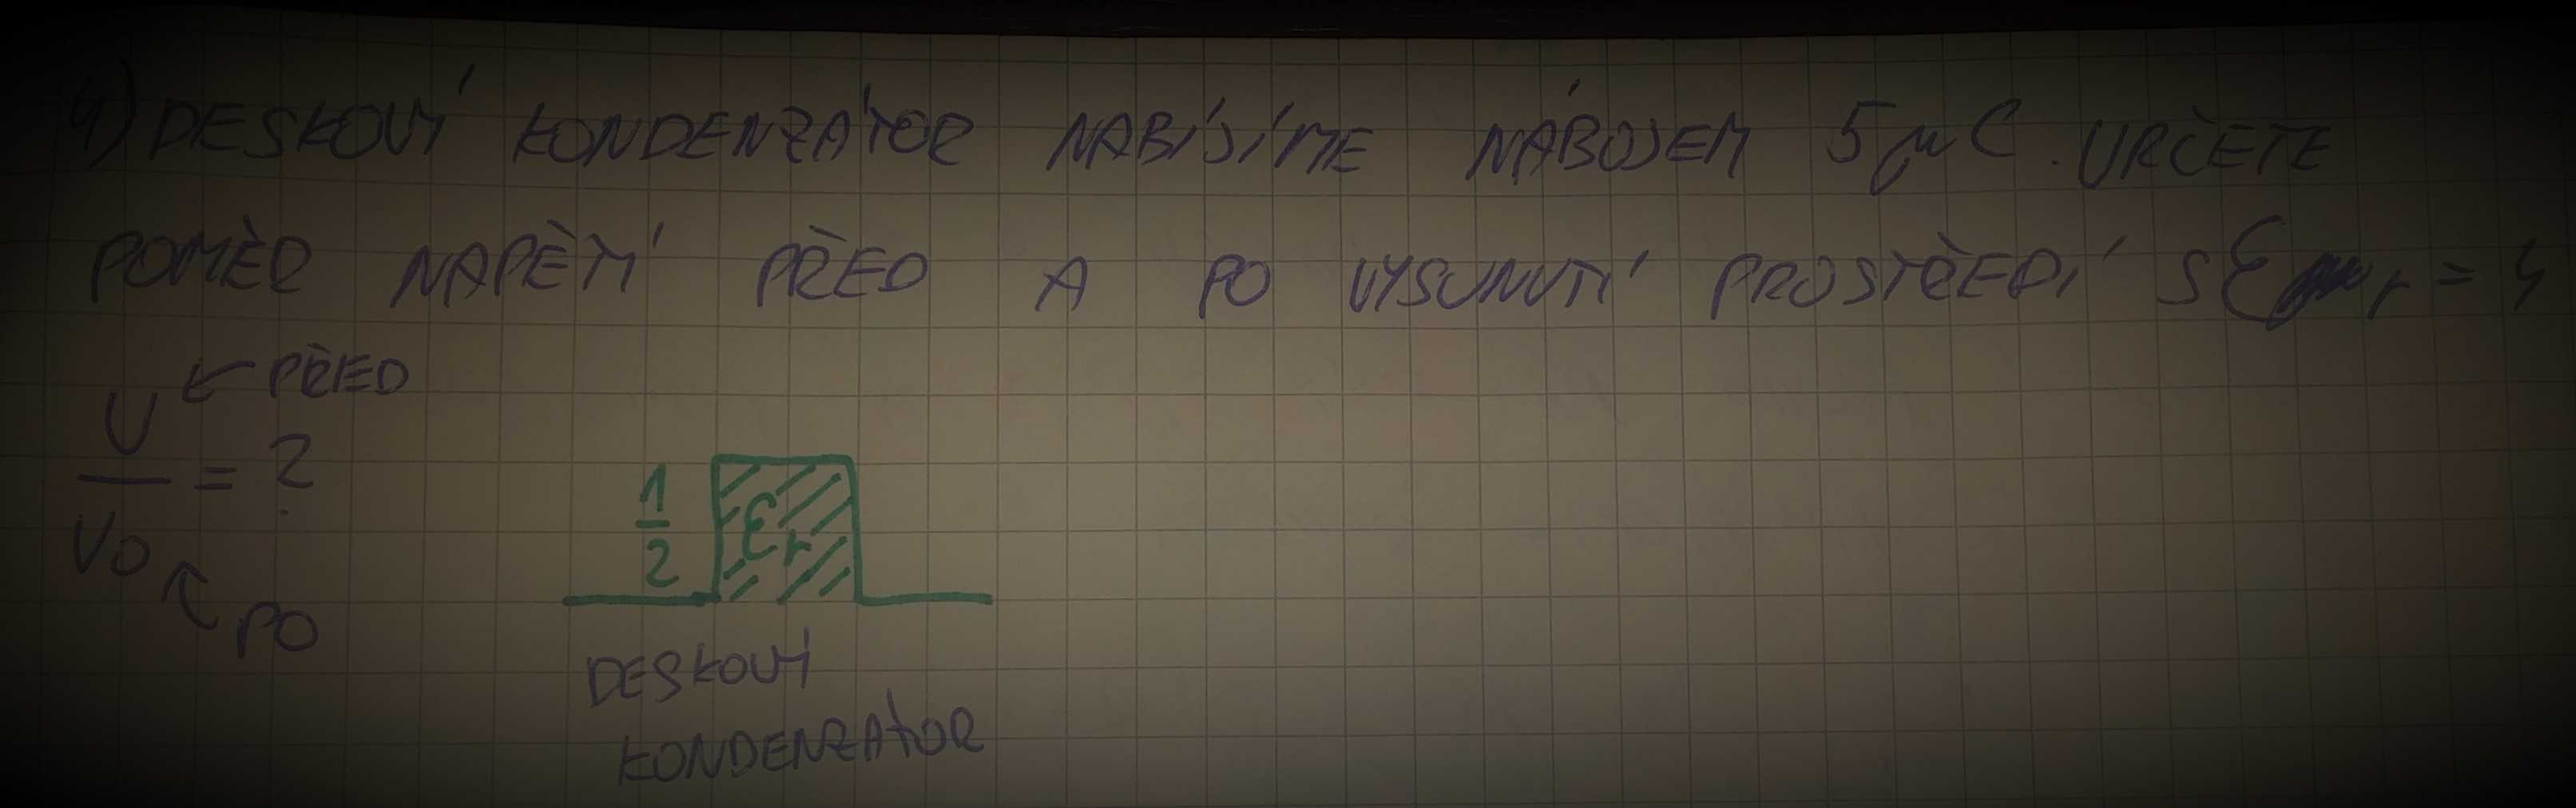 http://forum.matematika.cz/upload3/img/2018-01/51913_20180113_145005.jpg